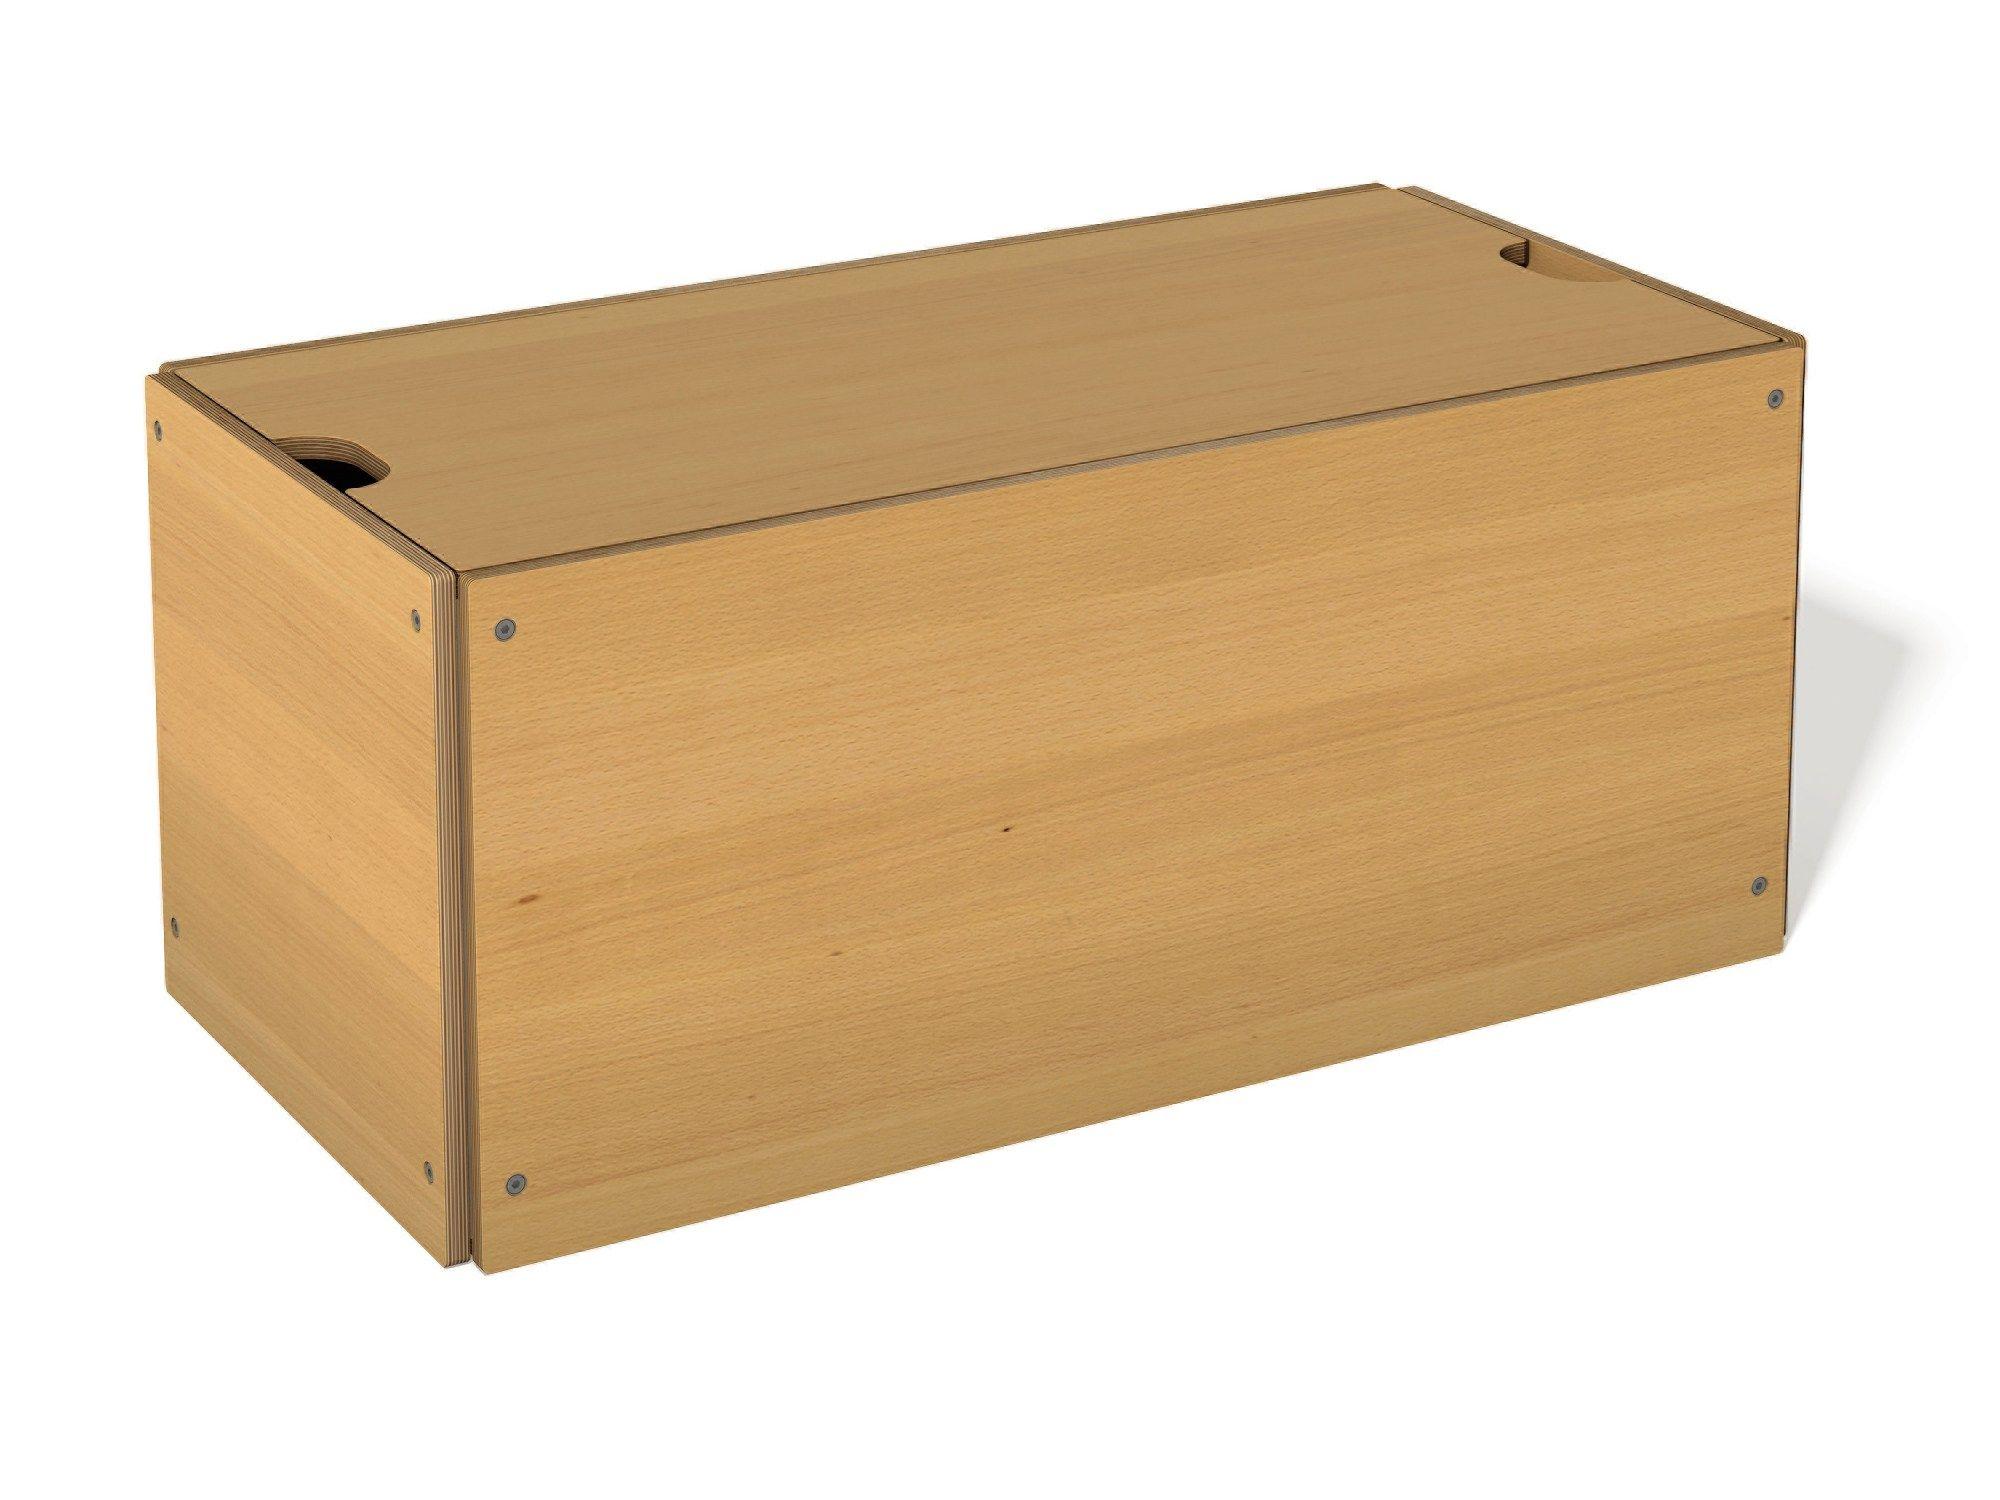 bettkasten truhe by m ller m belwerkst tten design rolf heide. Black Bedroom Furniture Sets. Home Design Ideas